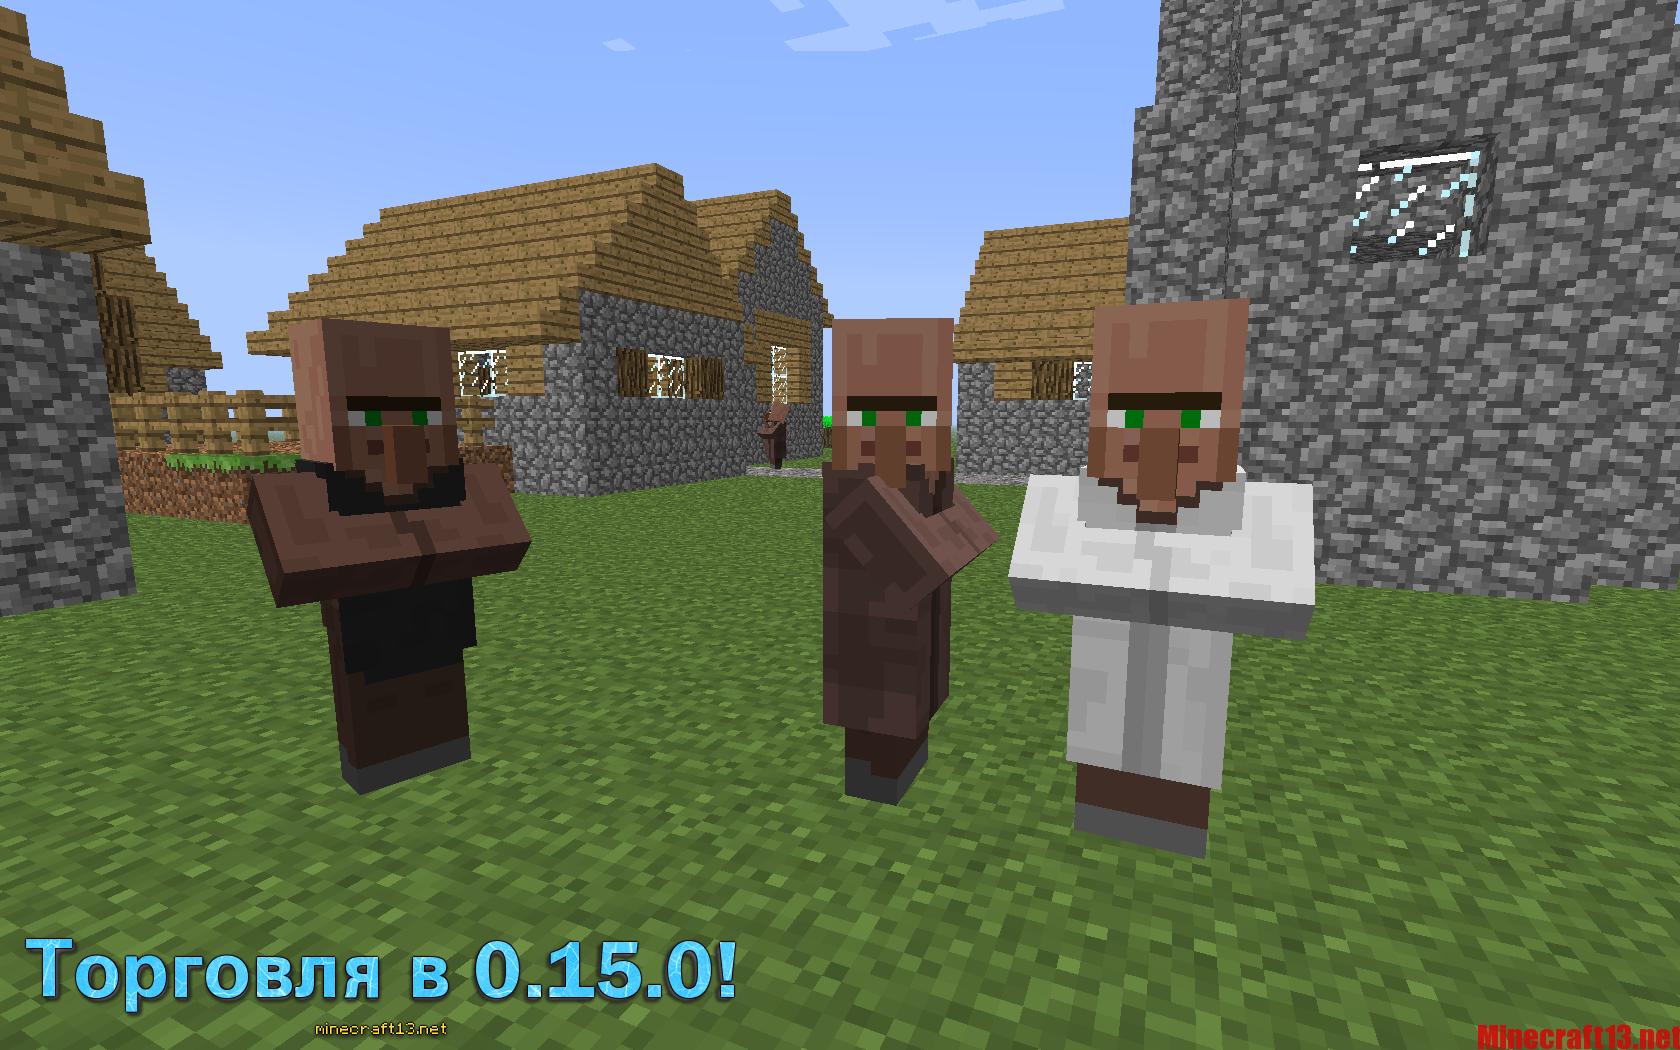 Cкачать Minecraft PE 0.15.10 Бесплатно на Андроид